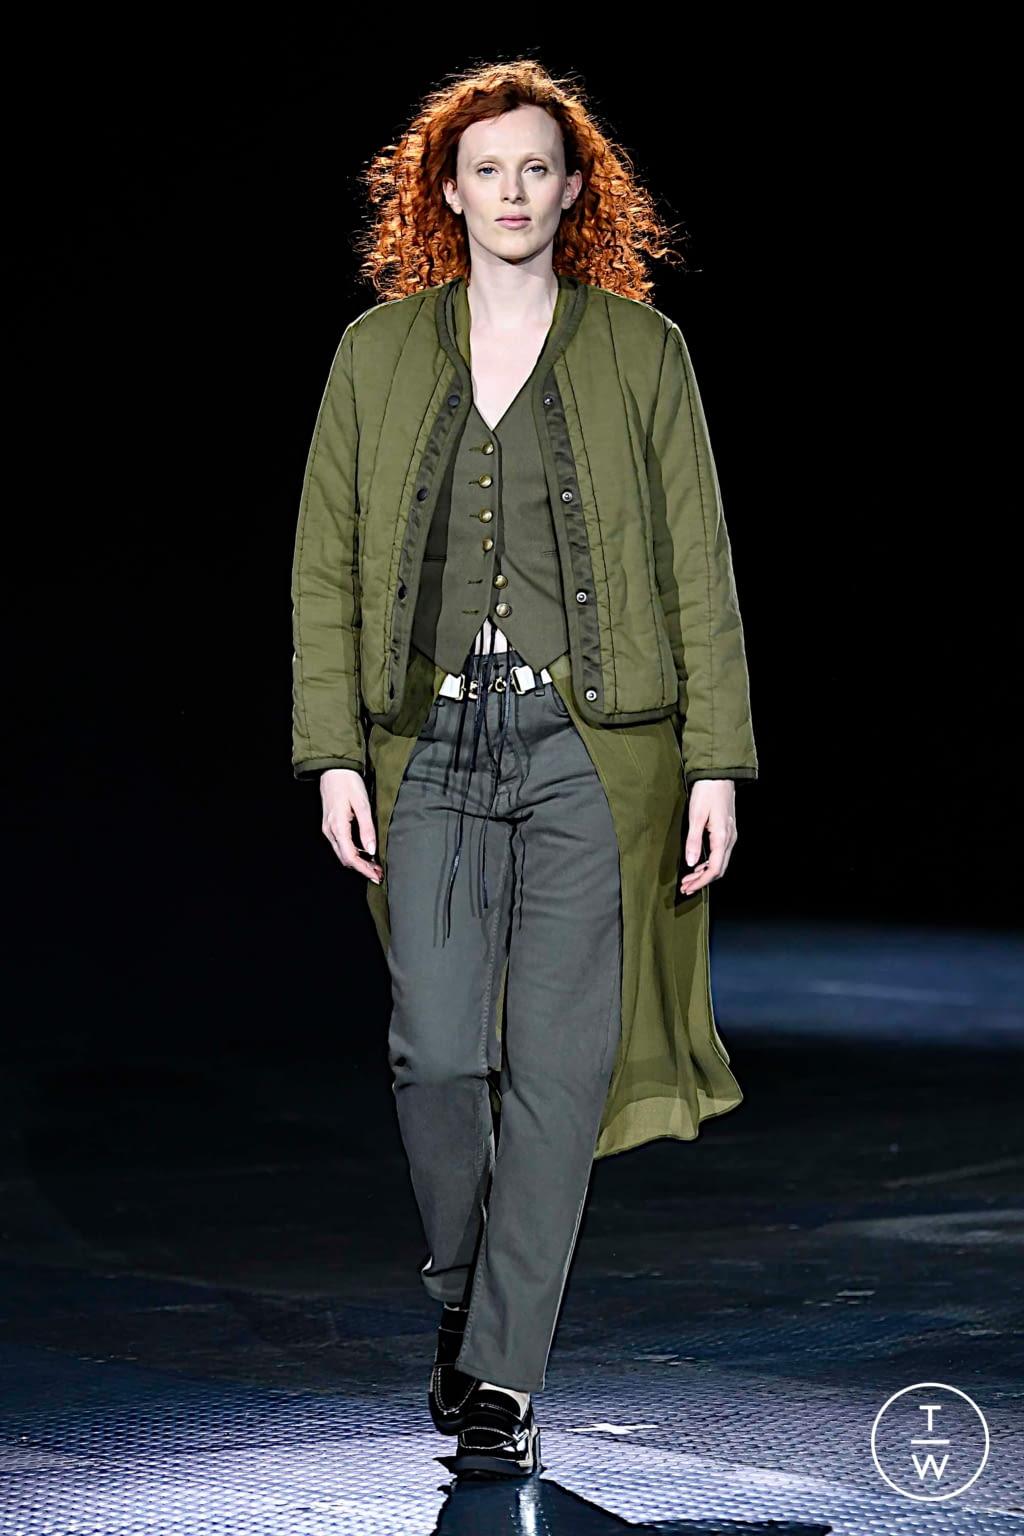 Fashion Week New York Spring/Summer 2020 look 41 de la collection Rag & Bone womenswear